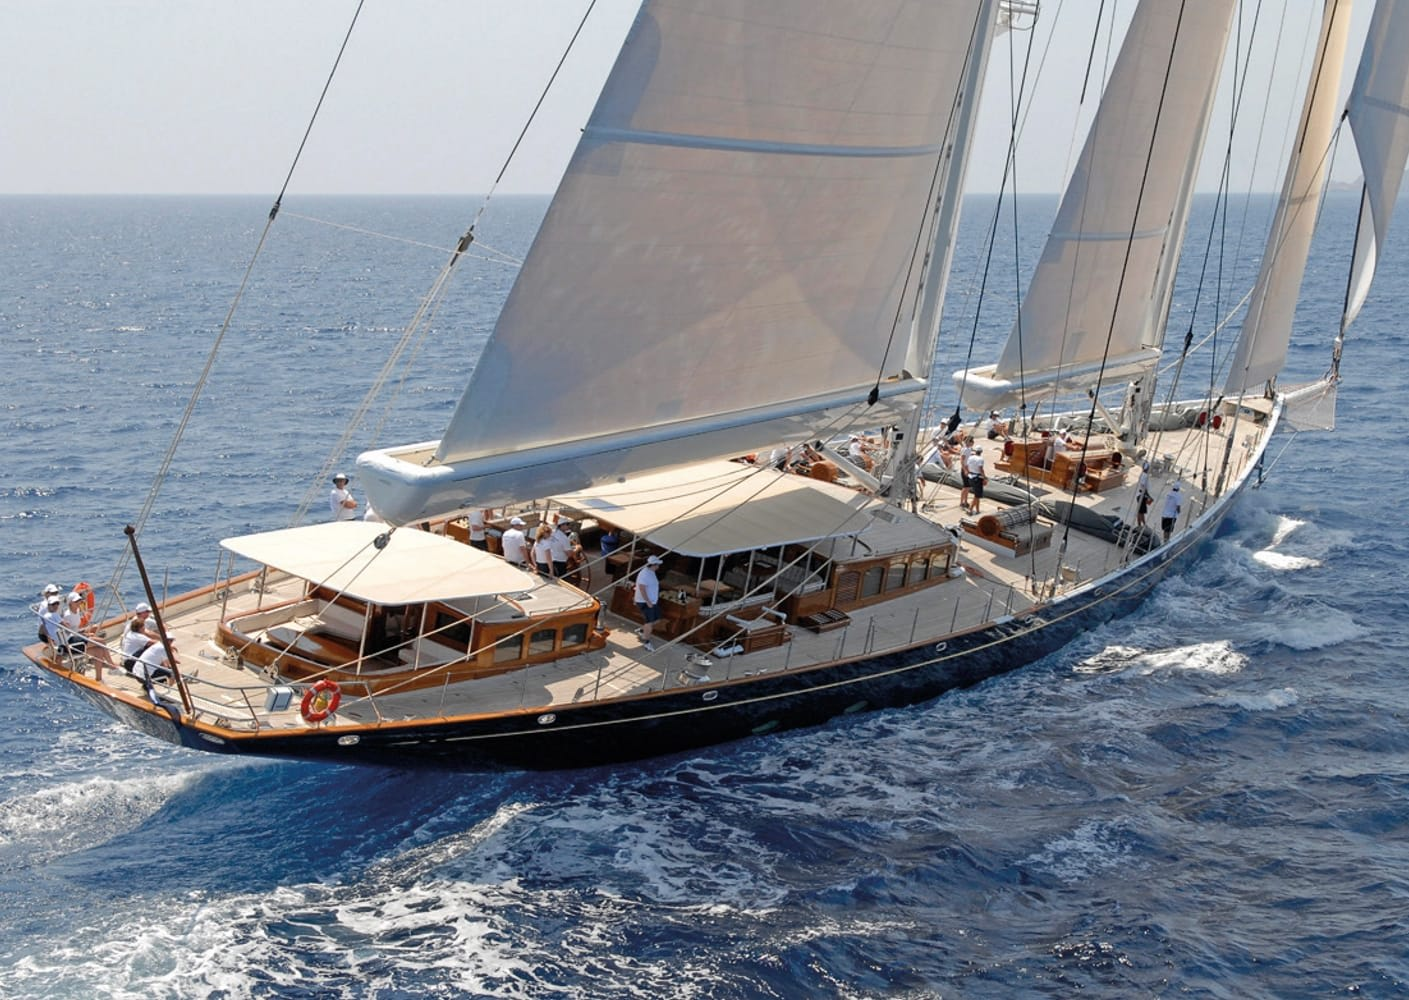 Image of Athos 62.0M (203.4FT) sailing yacht